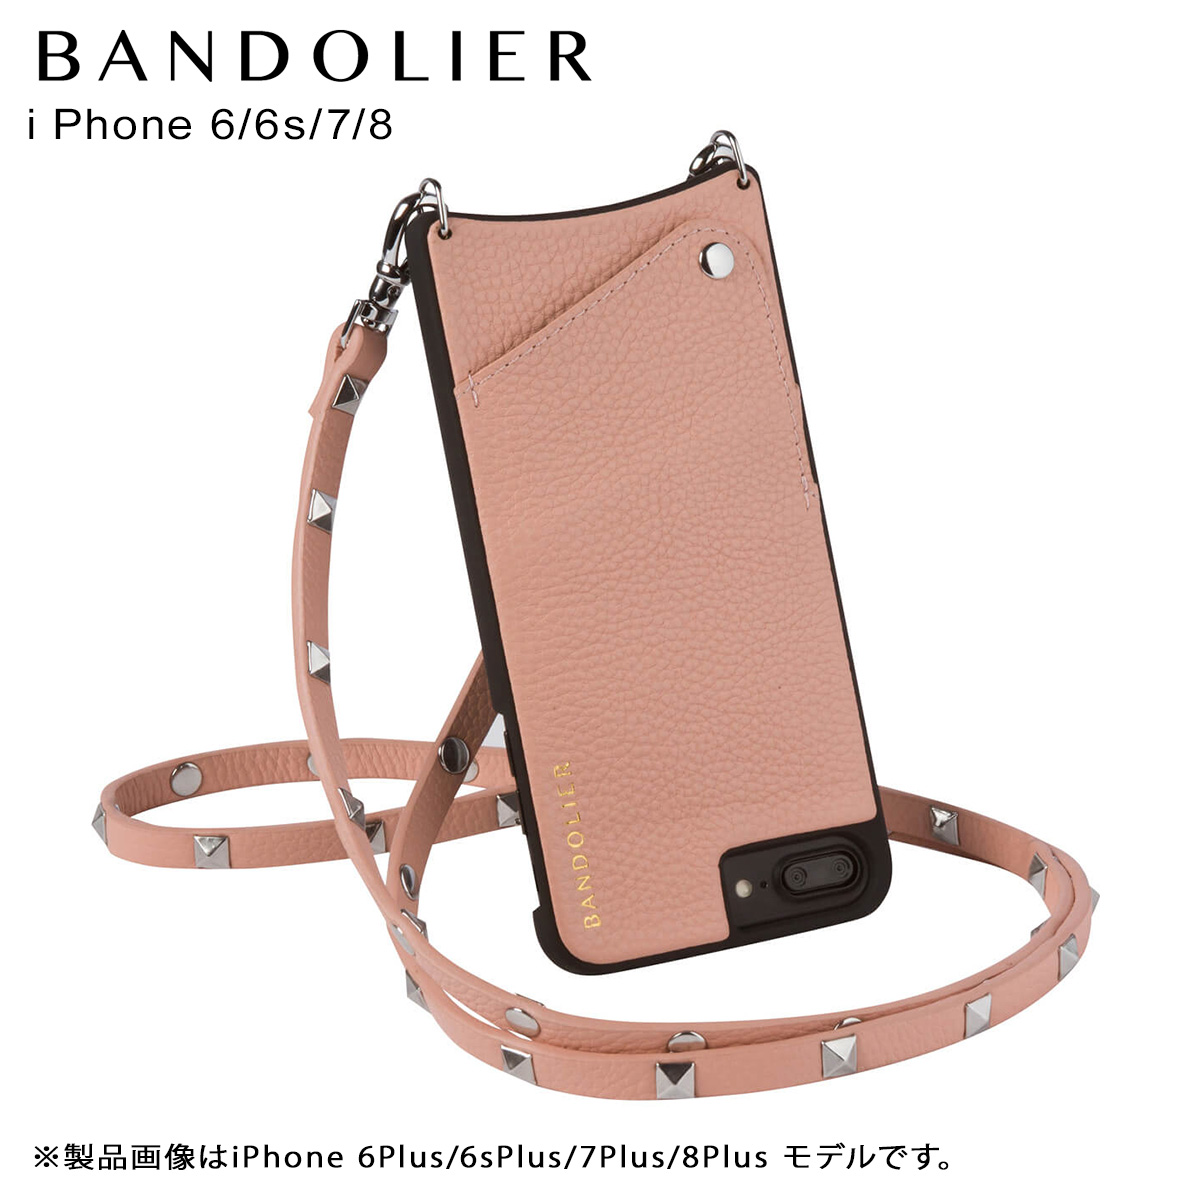 BANDOLIER iPhone8 iPhone7 6s SARAH BLUSH バンドリヤー ケース スマホ アイフォン メンズ レディース